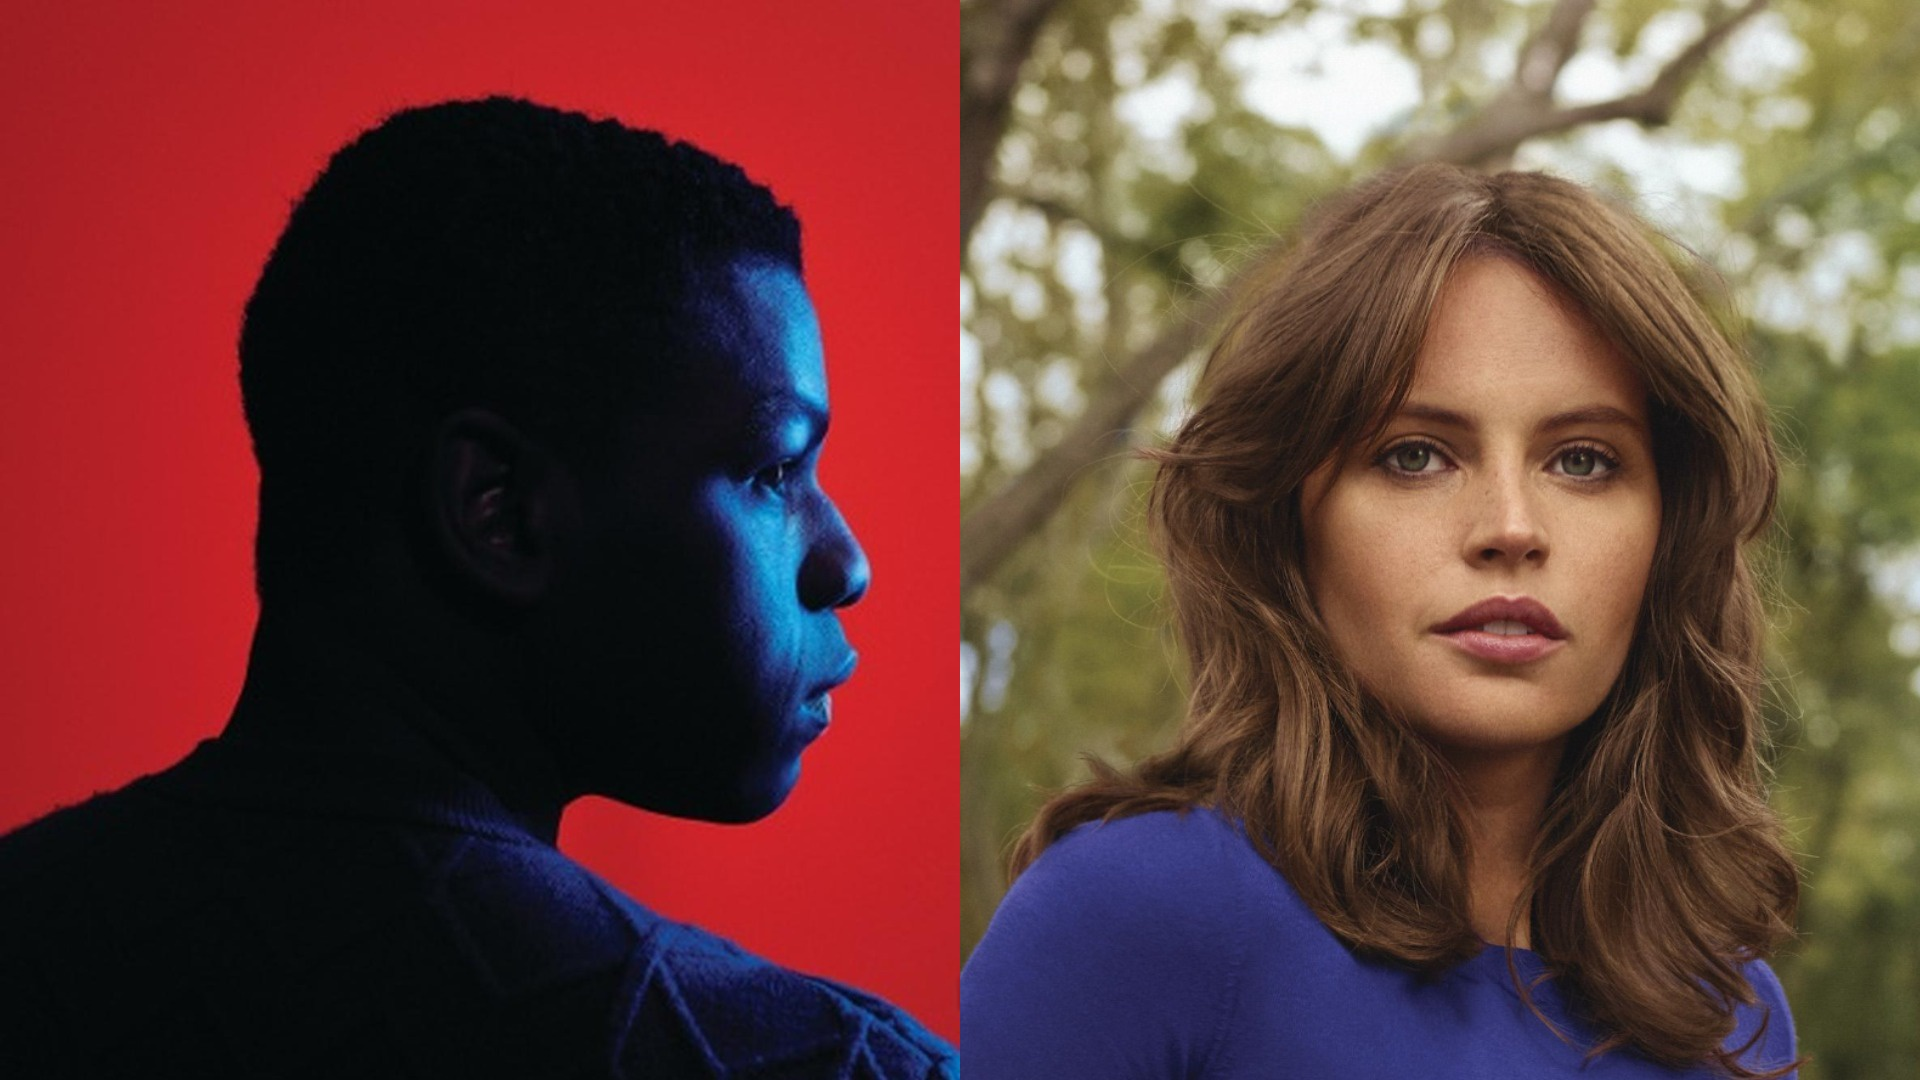 John Boyega, Felicity Jones Thriller 'Borderland' Is Casting + Filming Soon